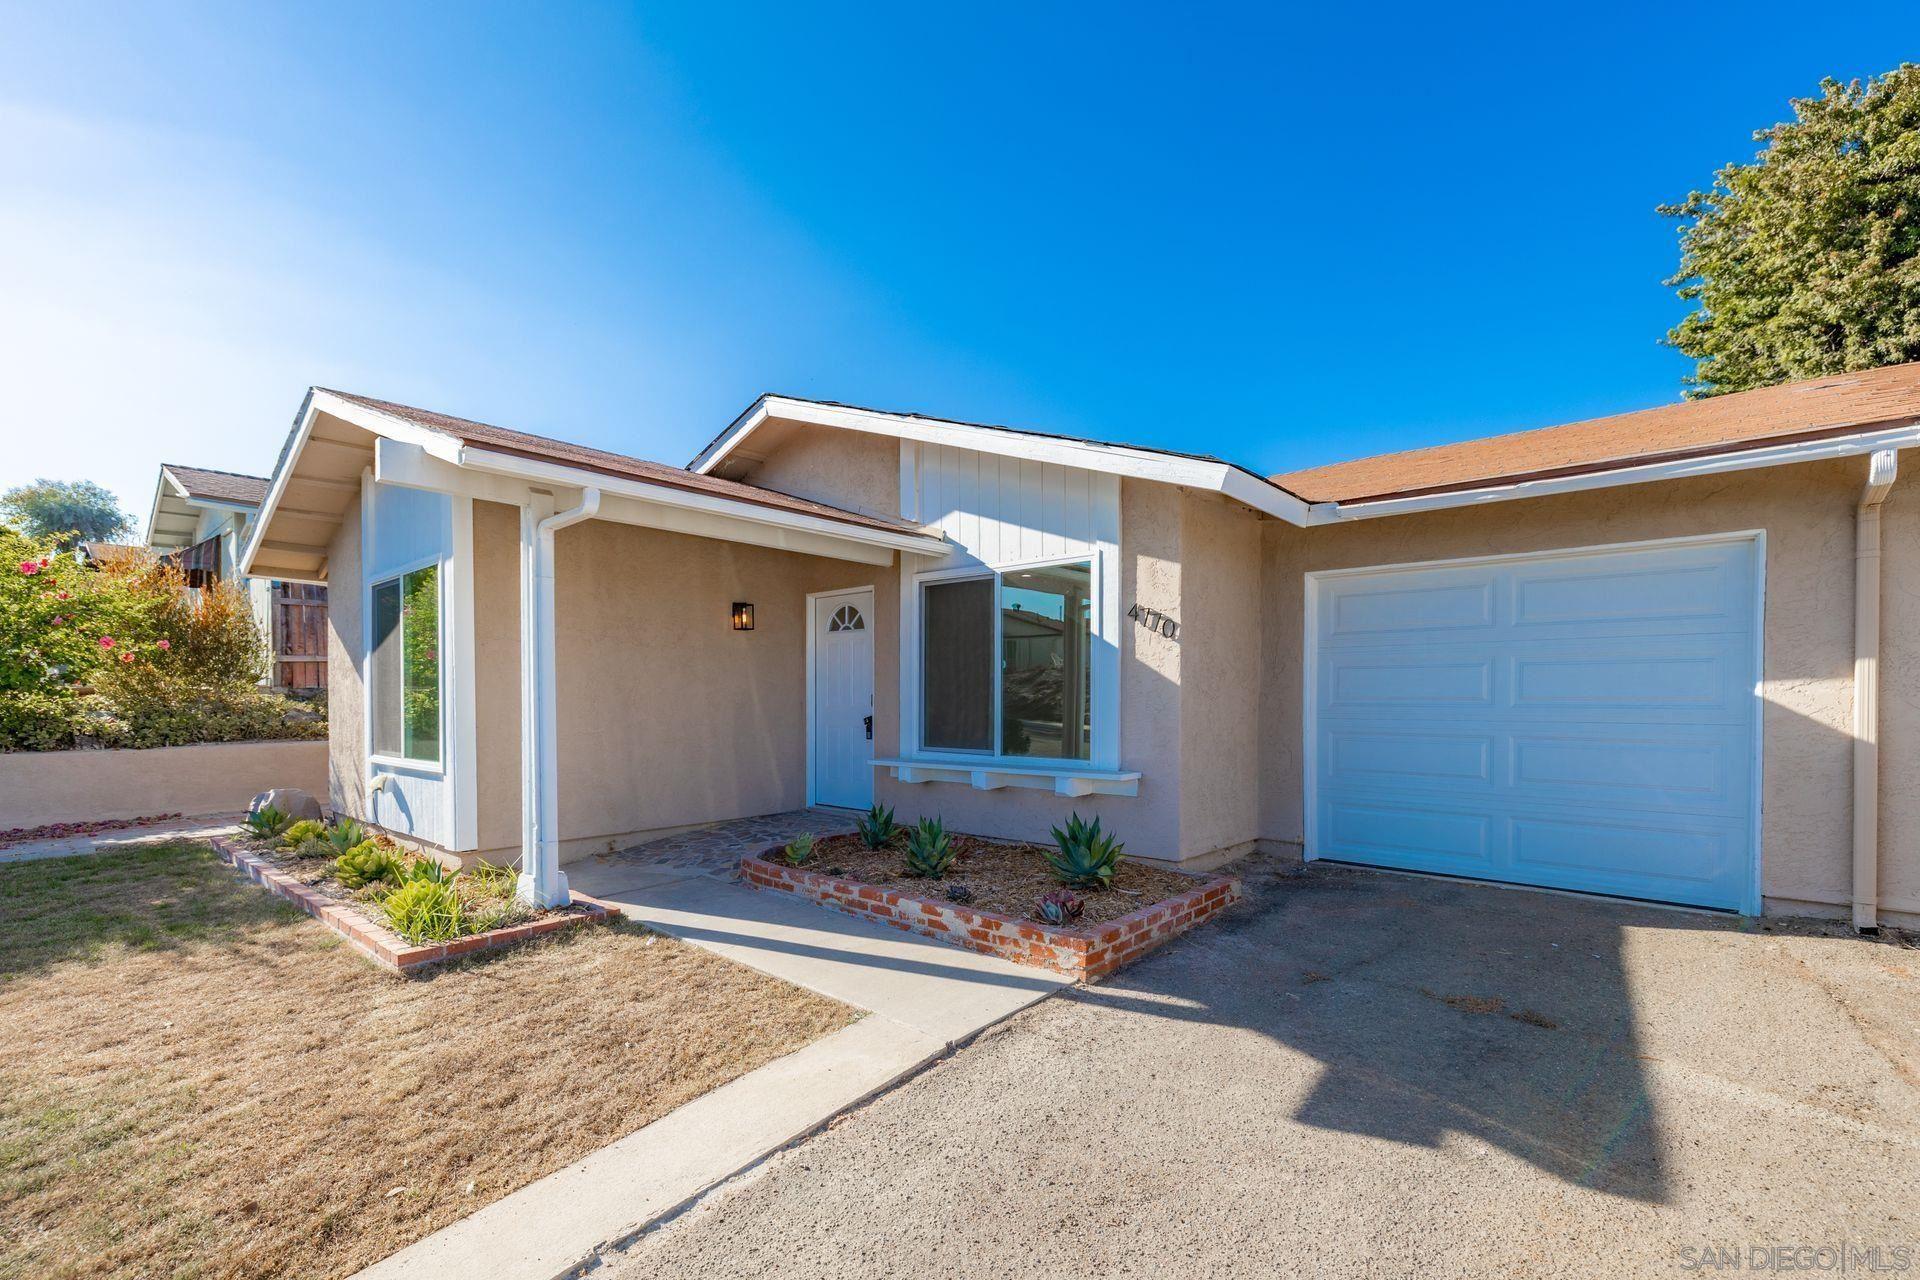 Photo of 4770 Jasmine St, Oceanside, CA 92056 (MLS # 210026515)